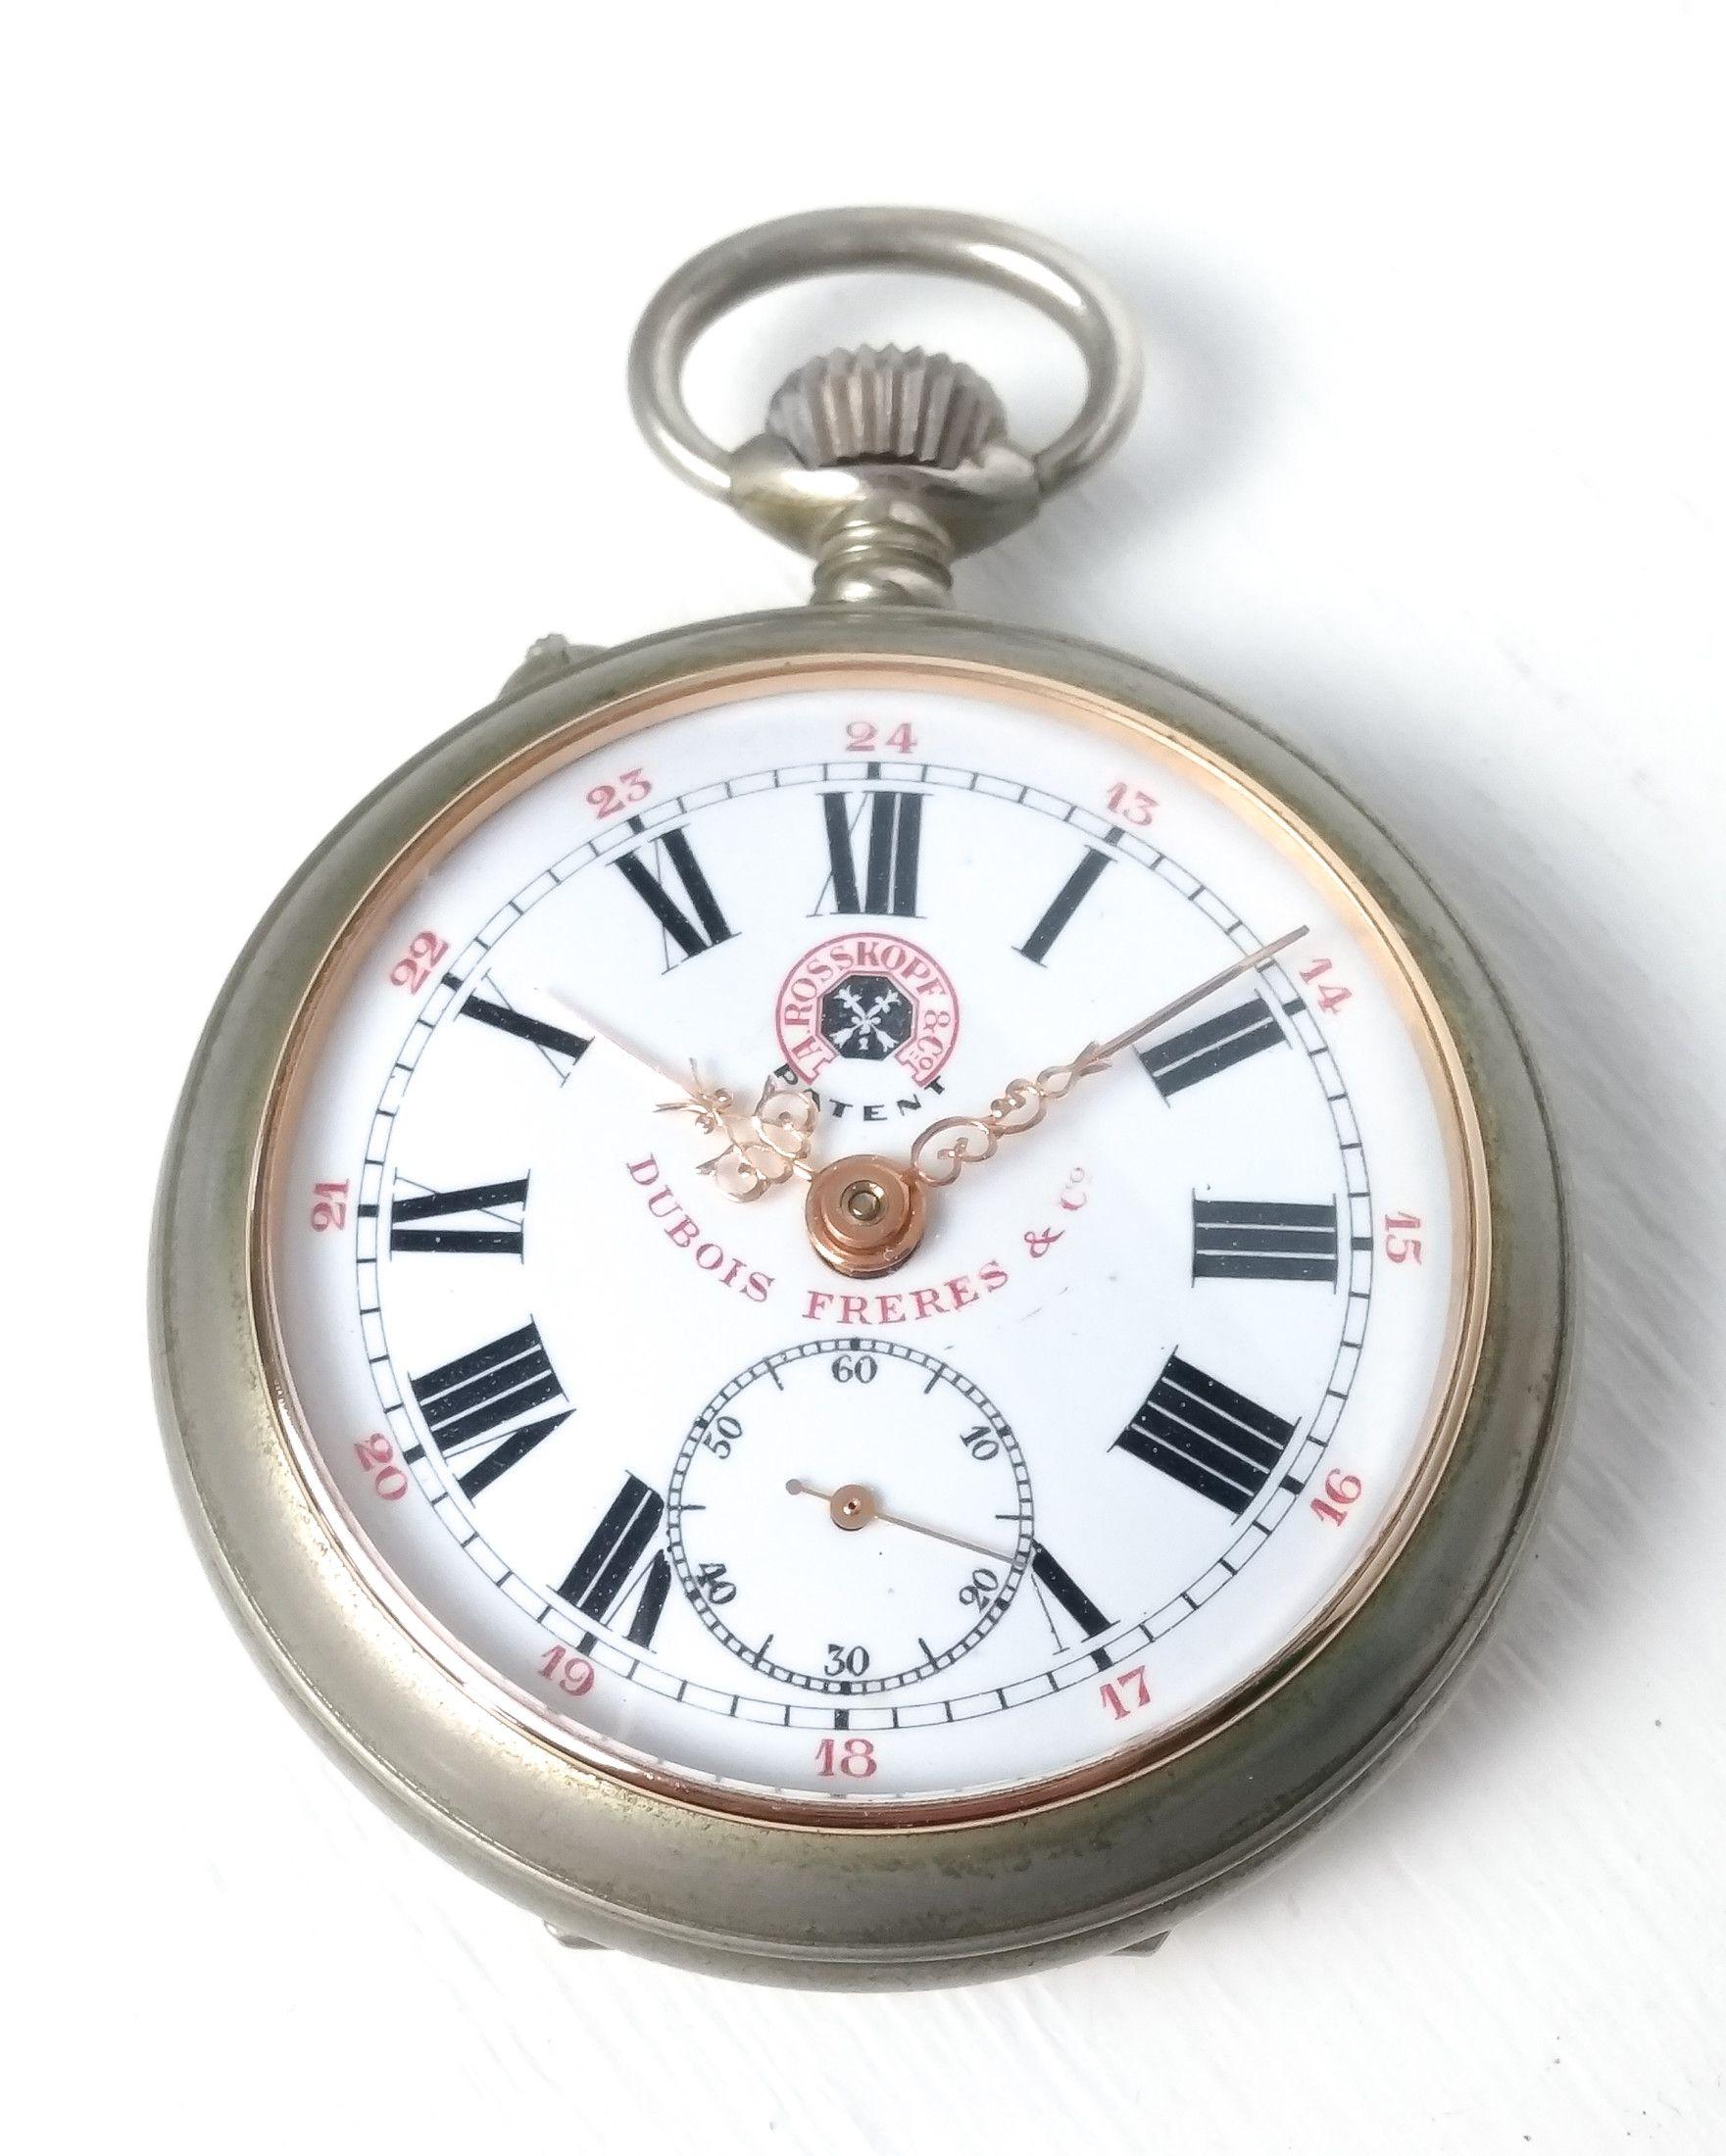 Orologio da tasca ROSSKOPF Dubois Freres & Co. Movimento